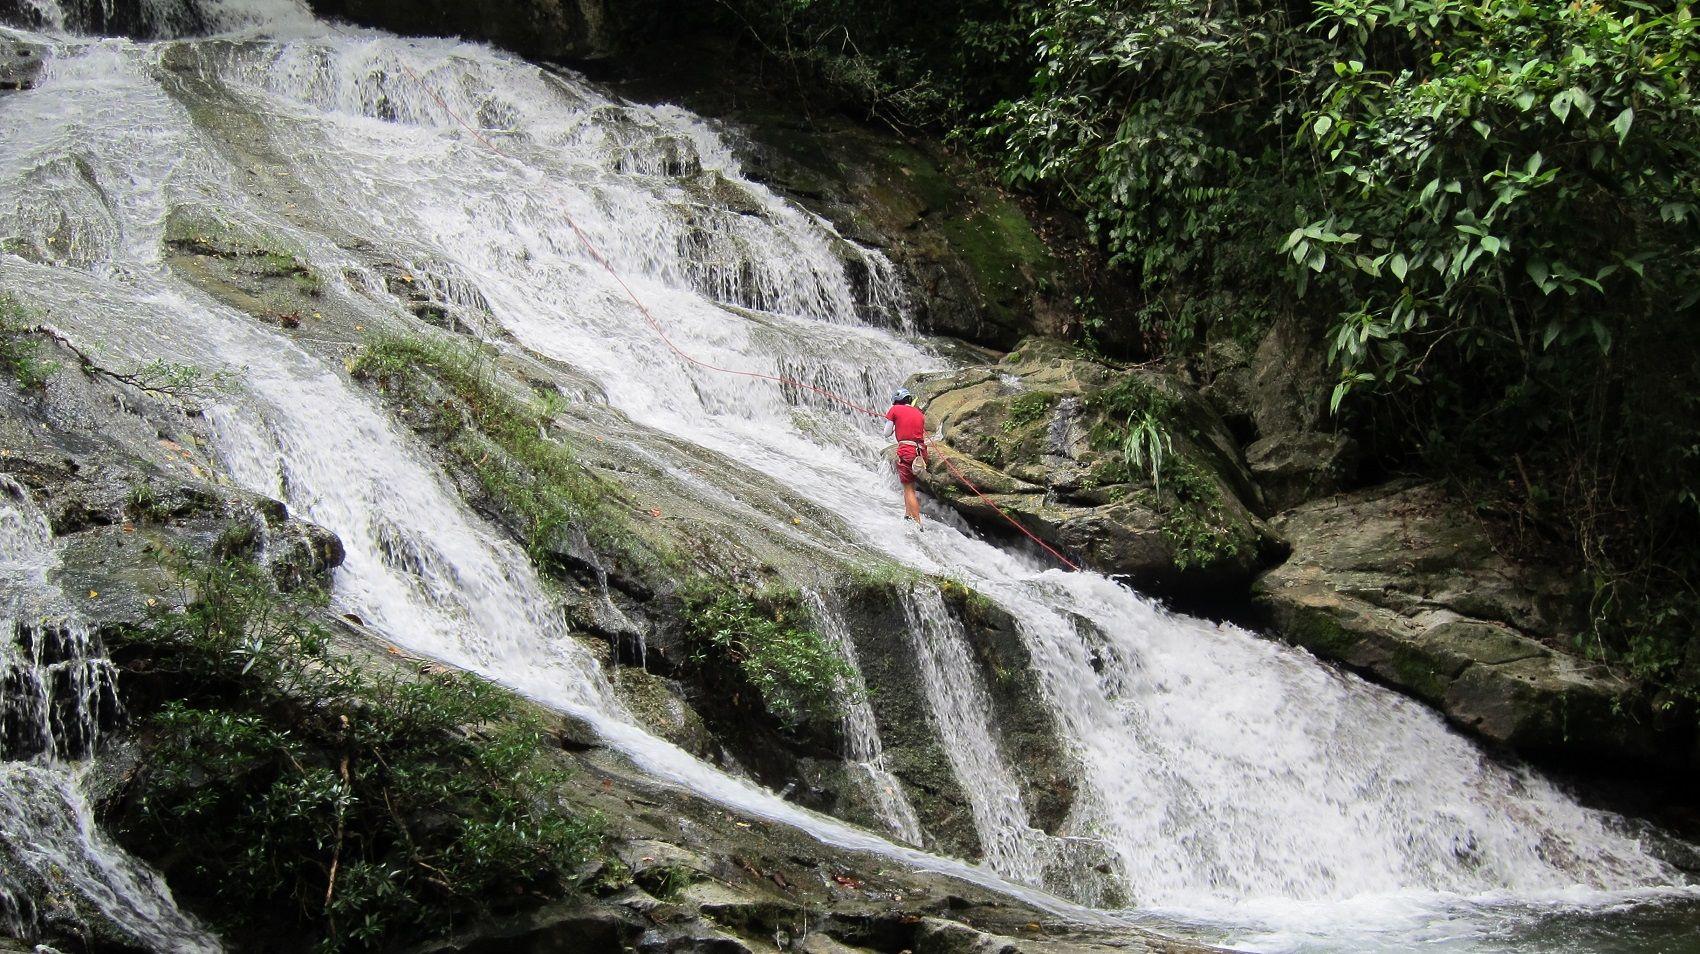 Bocawina zip line waterfall rappelling rappelling